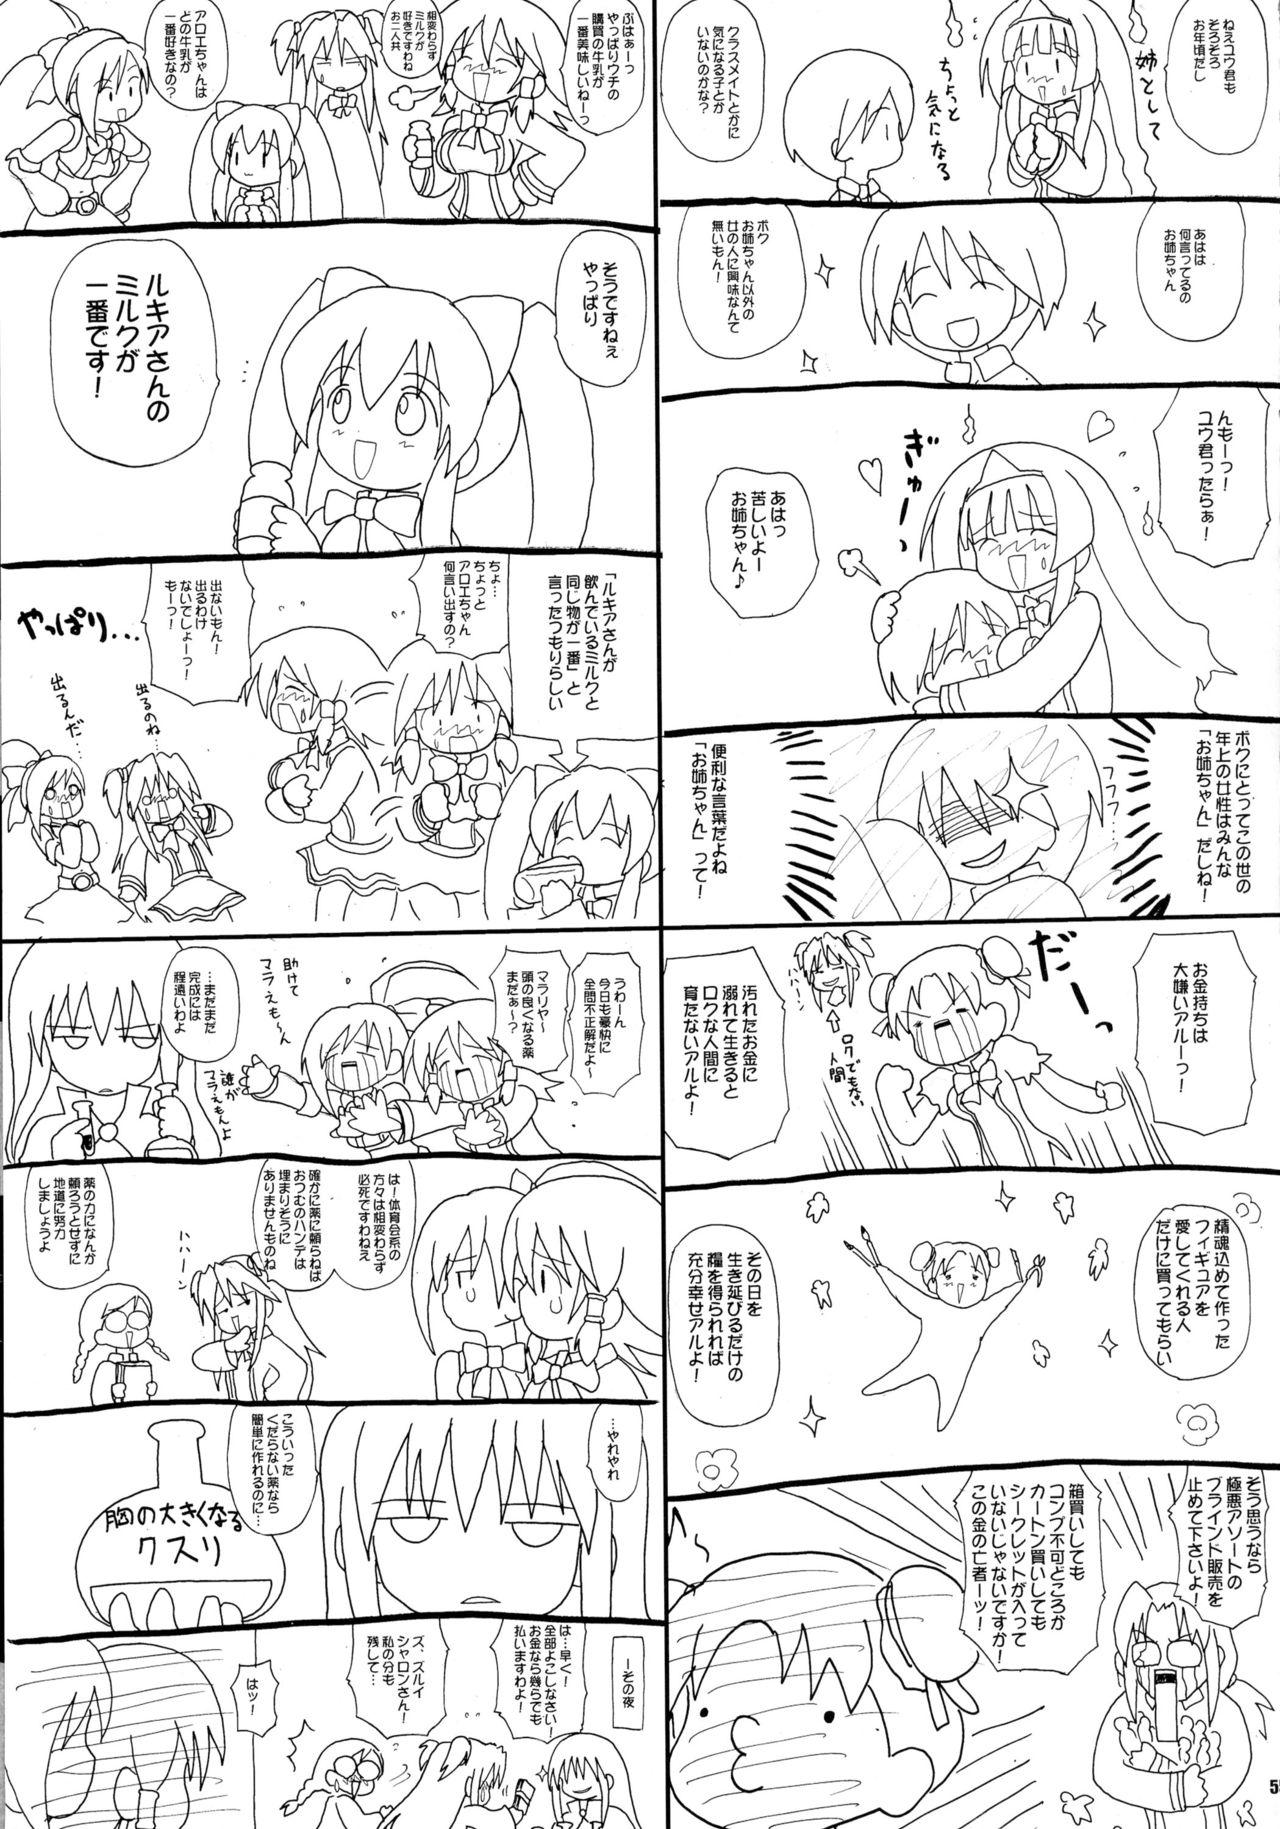 Kakomondai Shuu Soushuuhen + Alpha 54